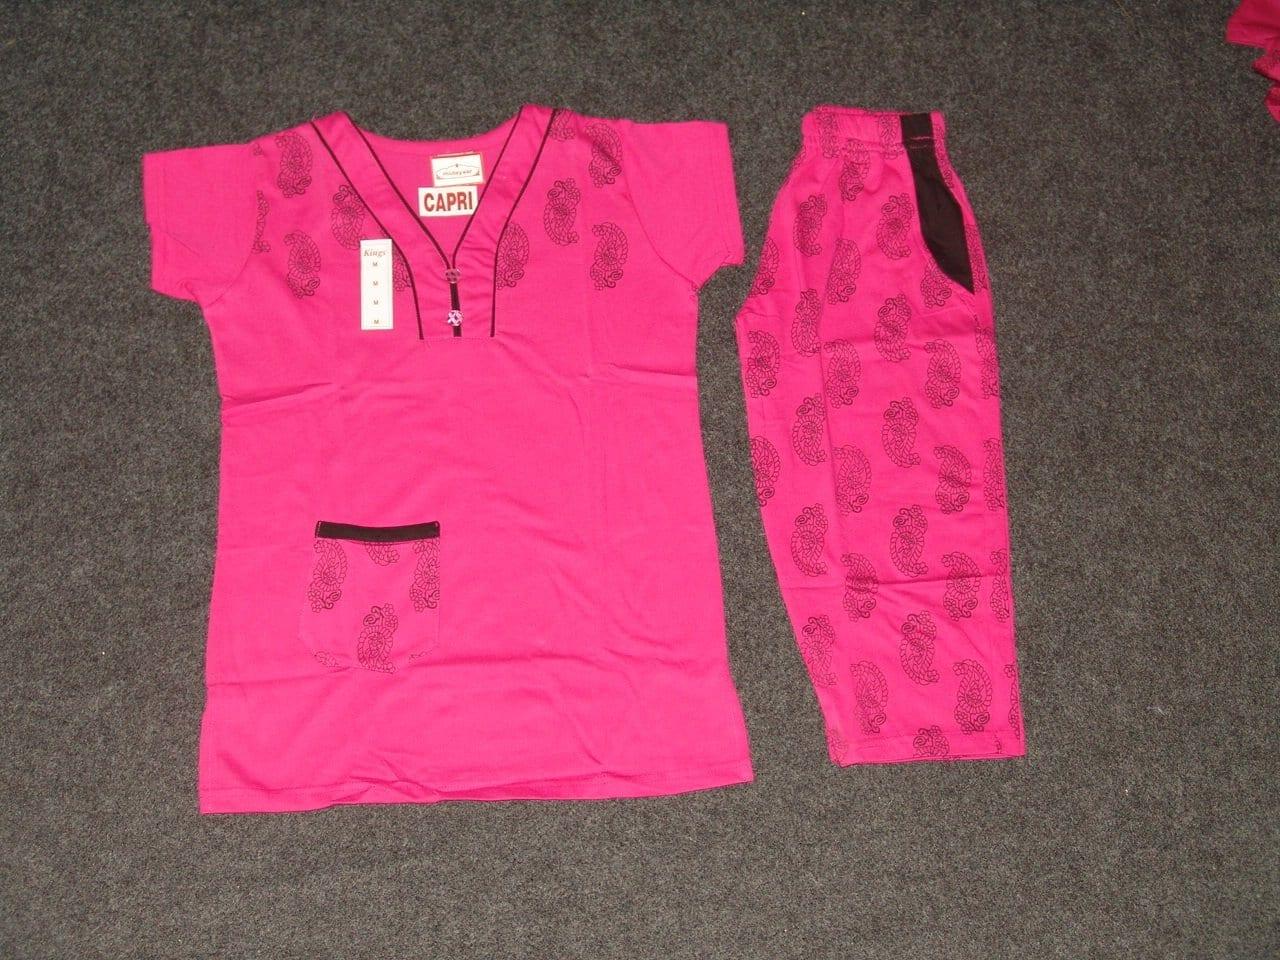 Cotton Soft fabric Ladies CAPRI Night Suit with Pocket NS099 1